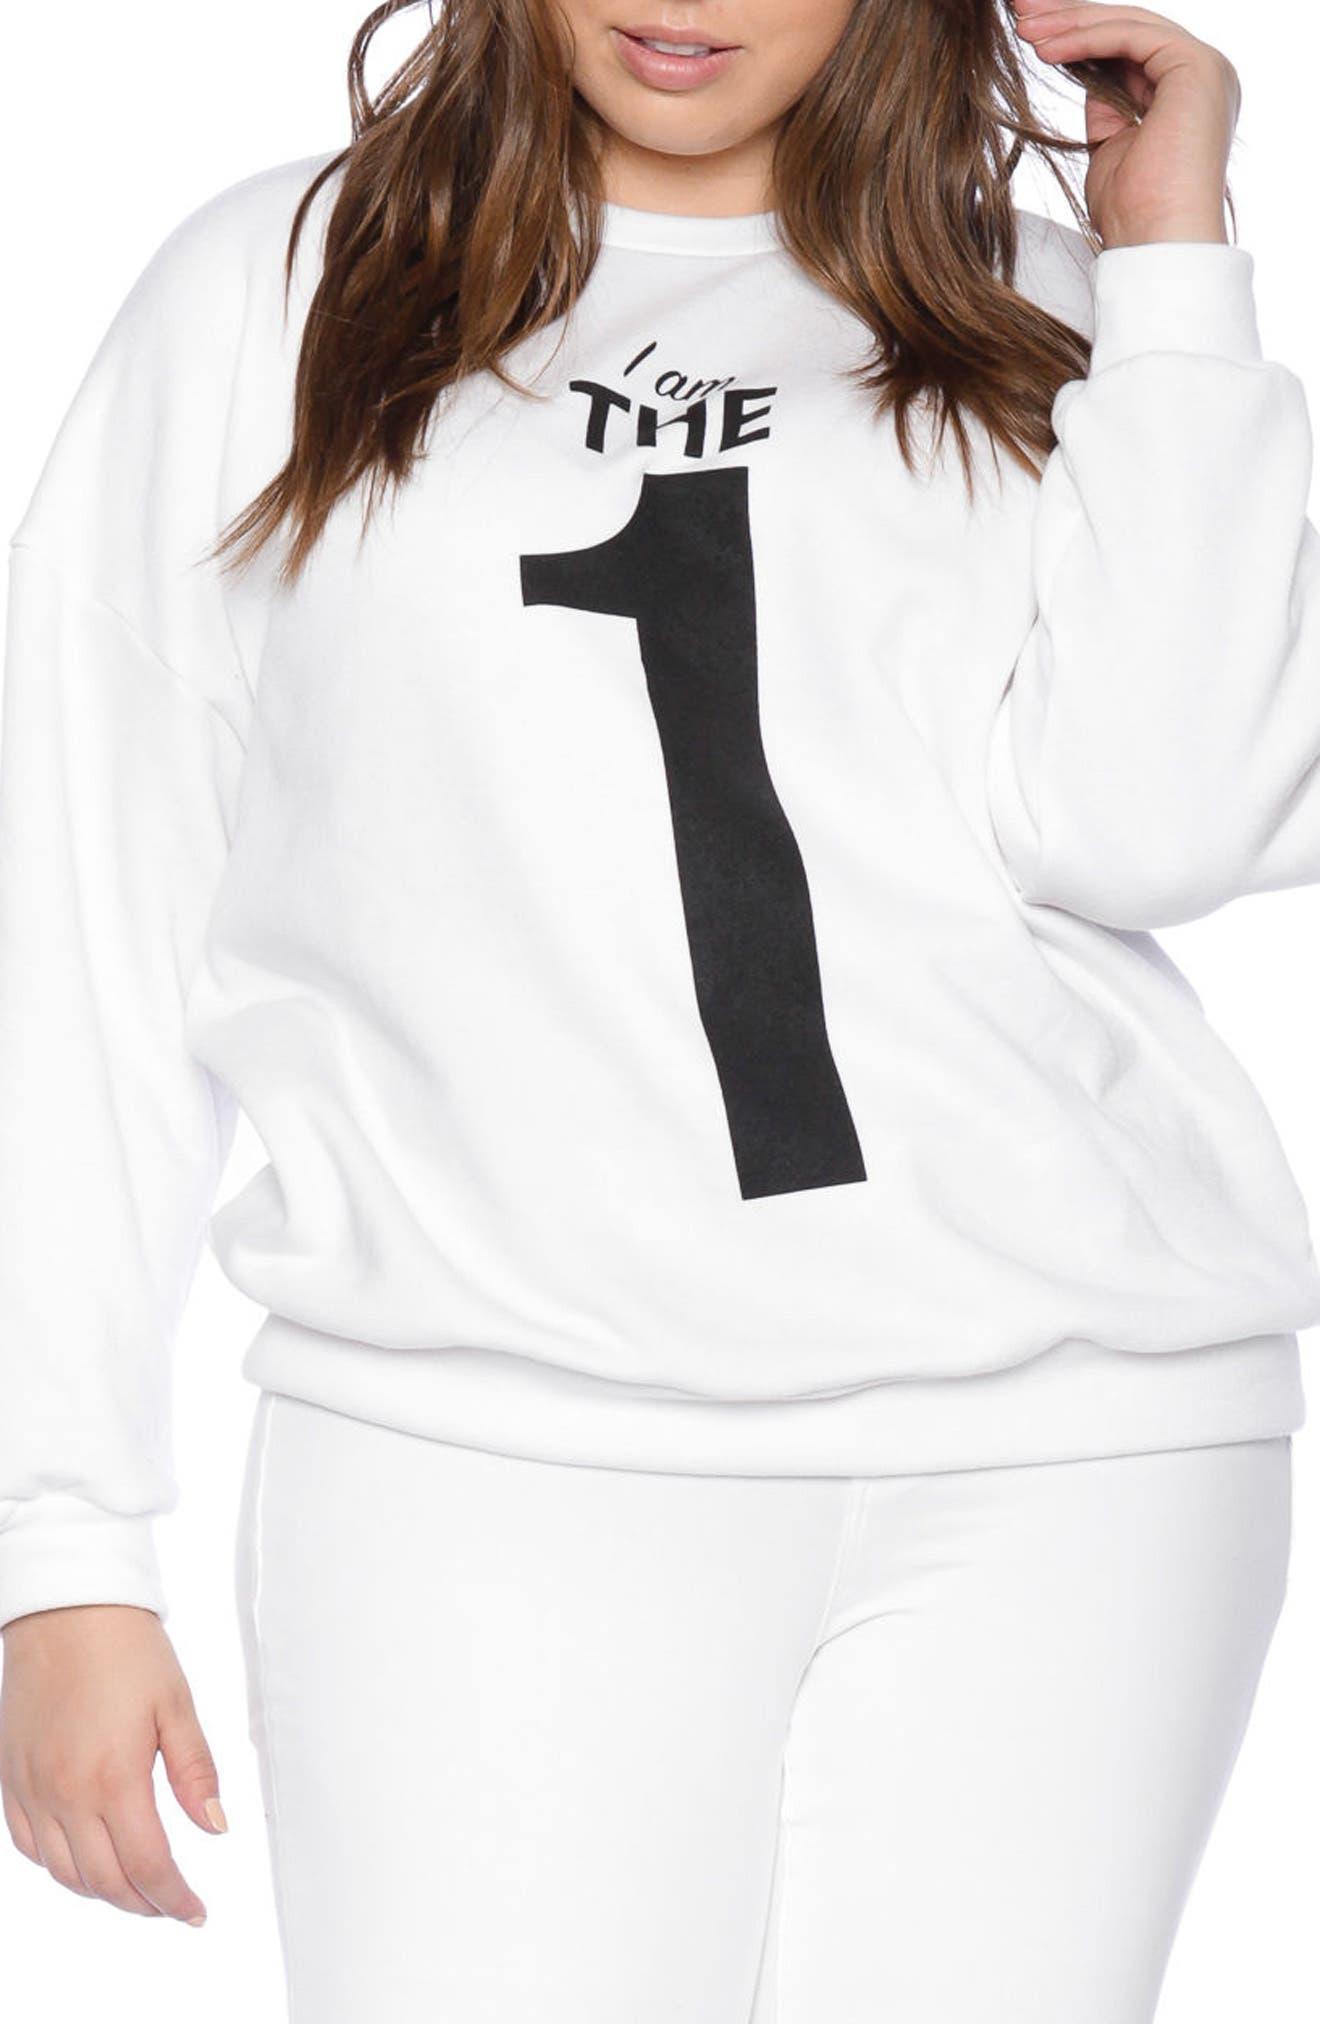 I Am the One Oversize Sweatshirt,                         Main,                         color, White